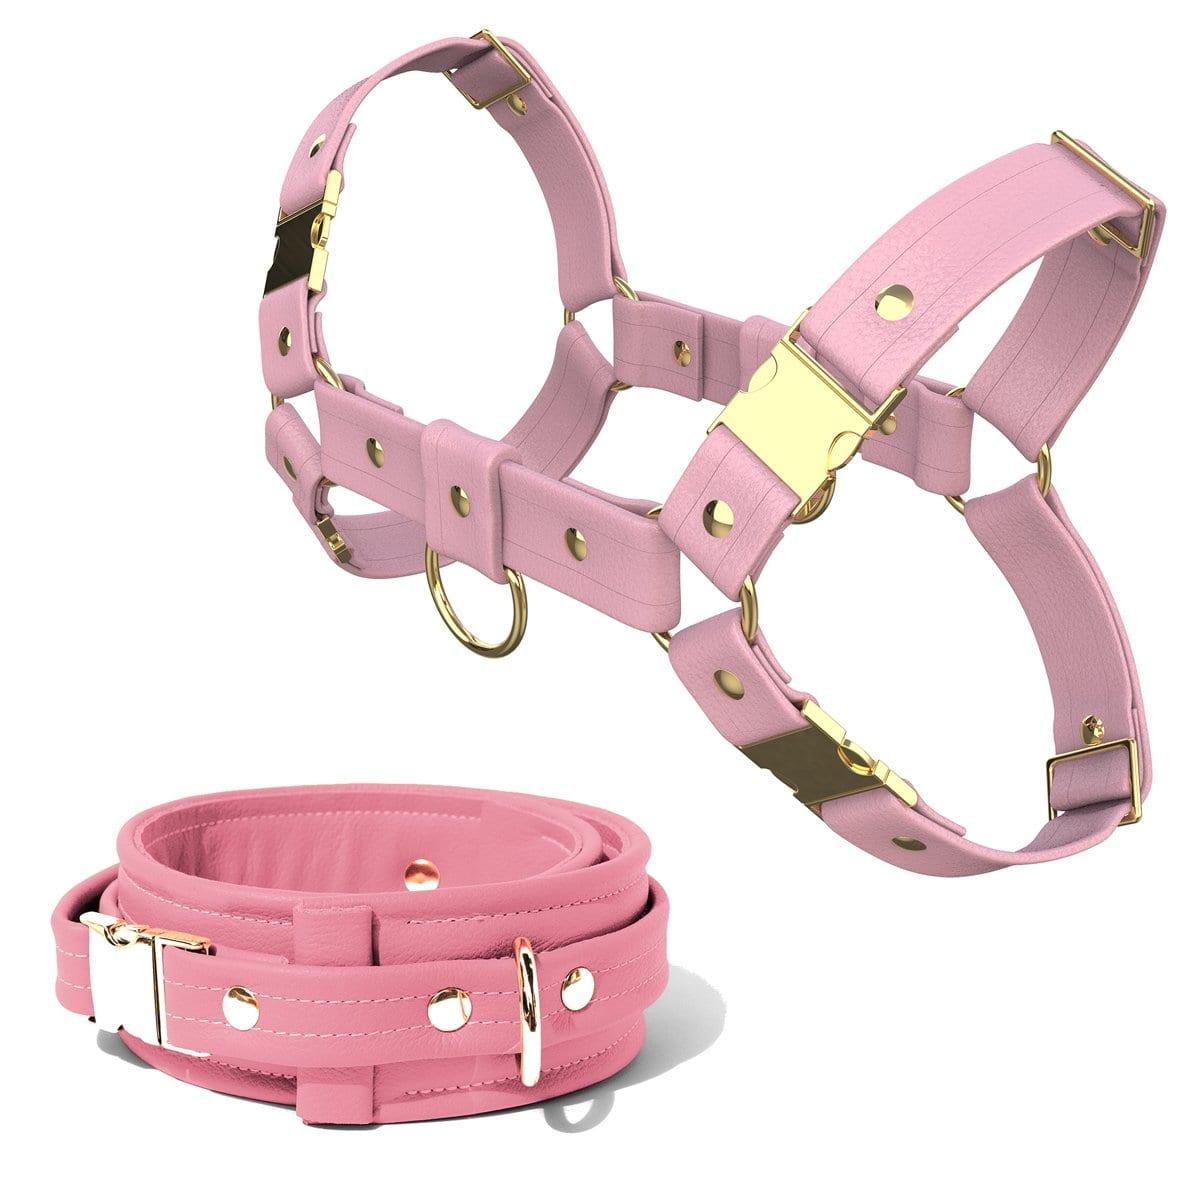 Bulldog Harness + Collar – Standard Leather – Pink - Gold Metal Fittings